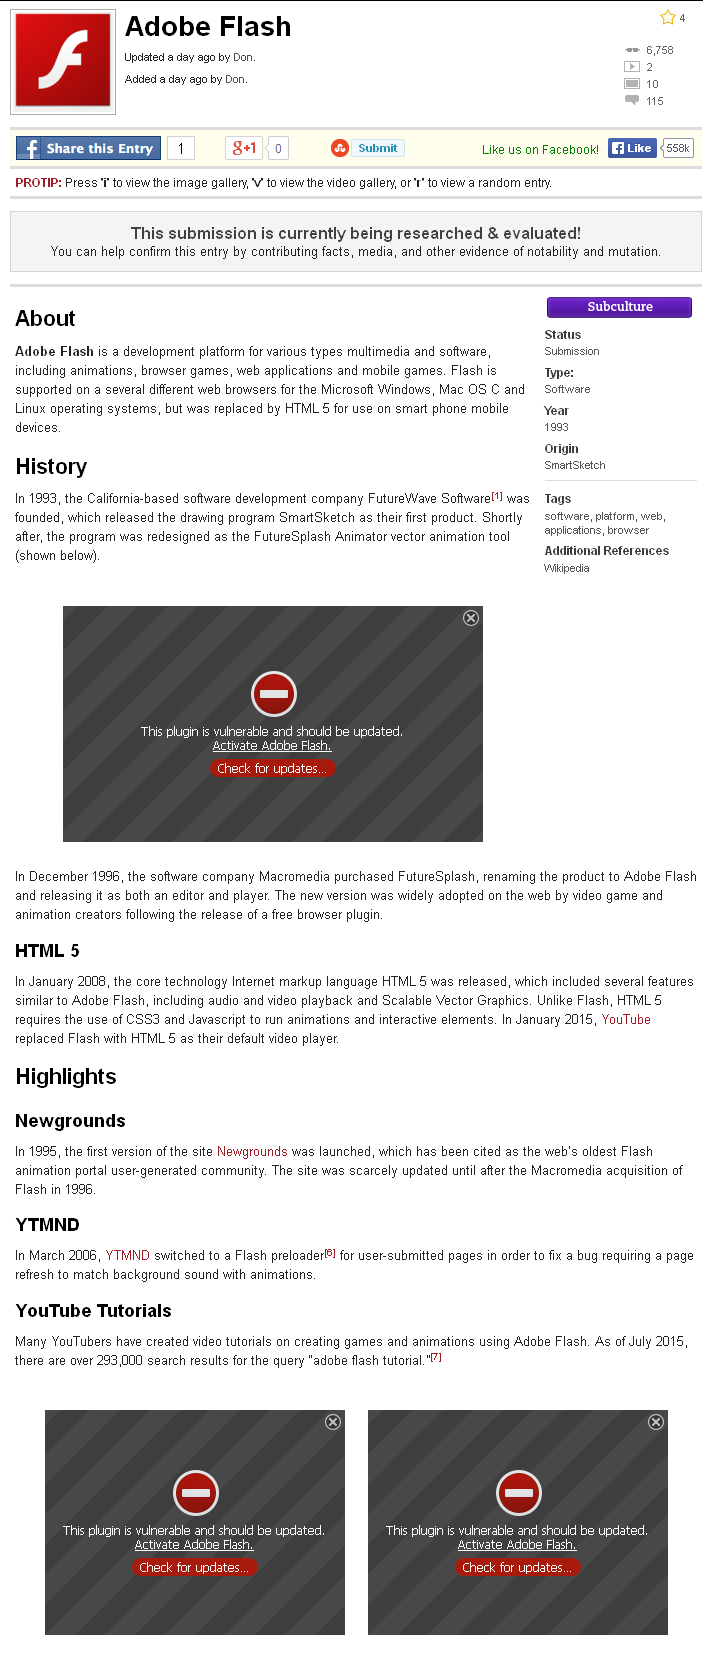 Adobe flash - Fail - check for updates | Adobe Flash | Know